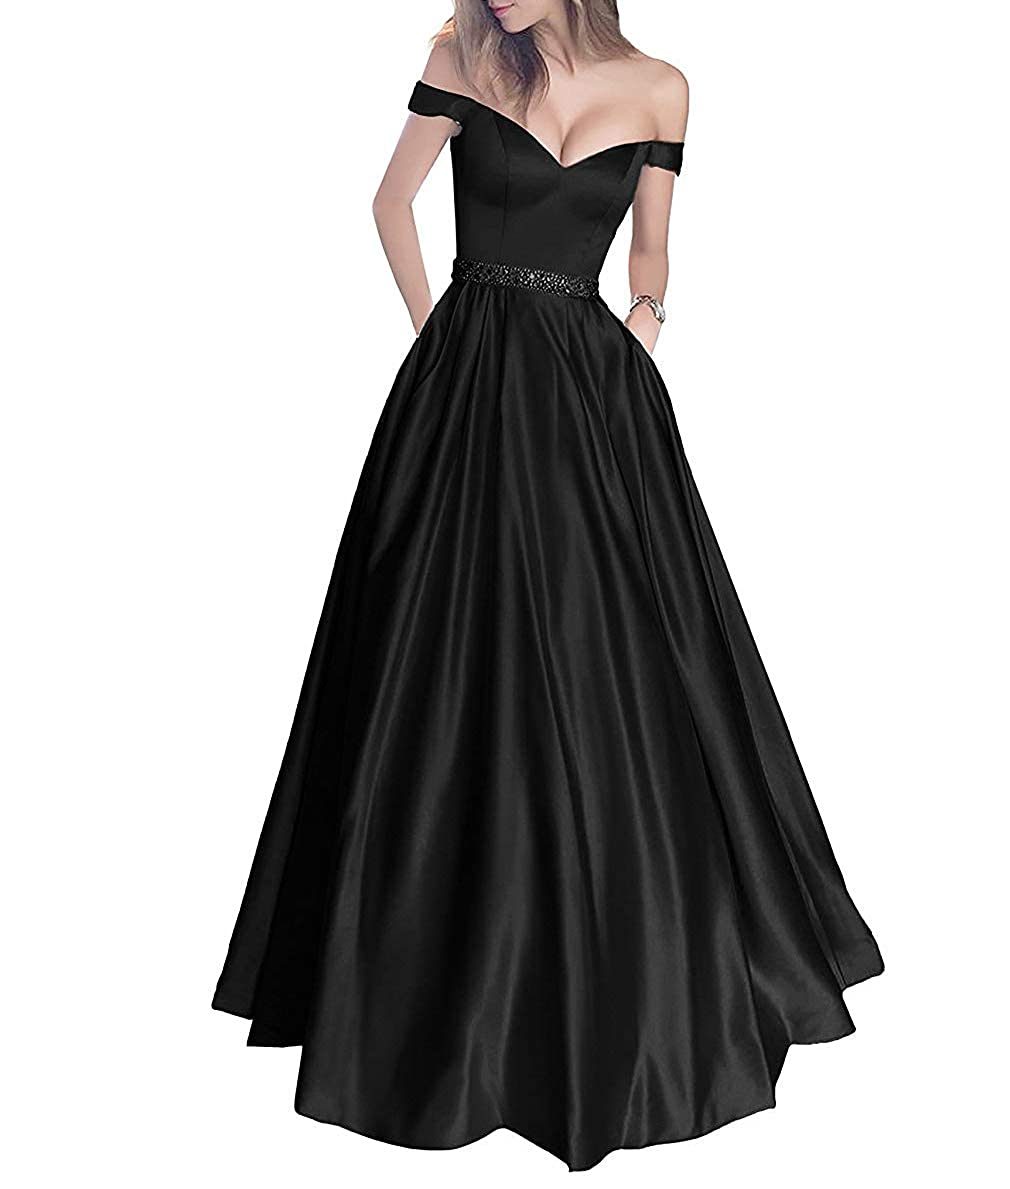 Style1 Black Engerla Bridal Women's Satin Prom Dress Off The Shoulder Beaded Aline Long Homecoming Dress